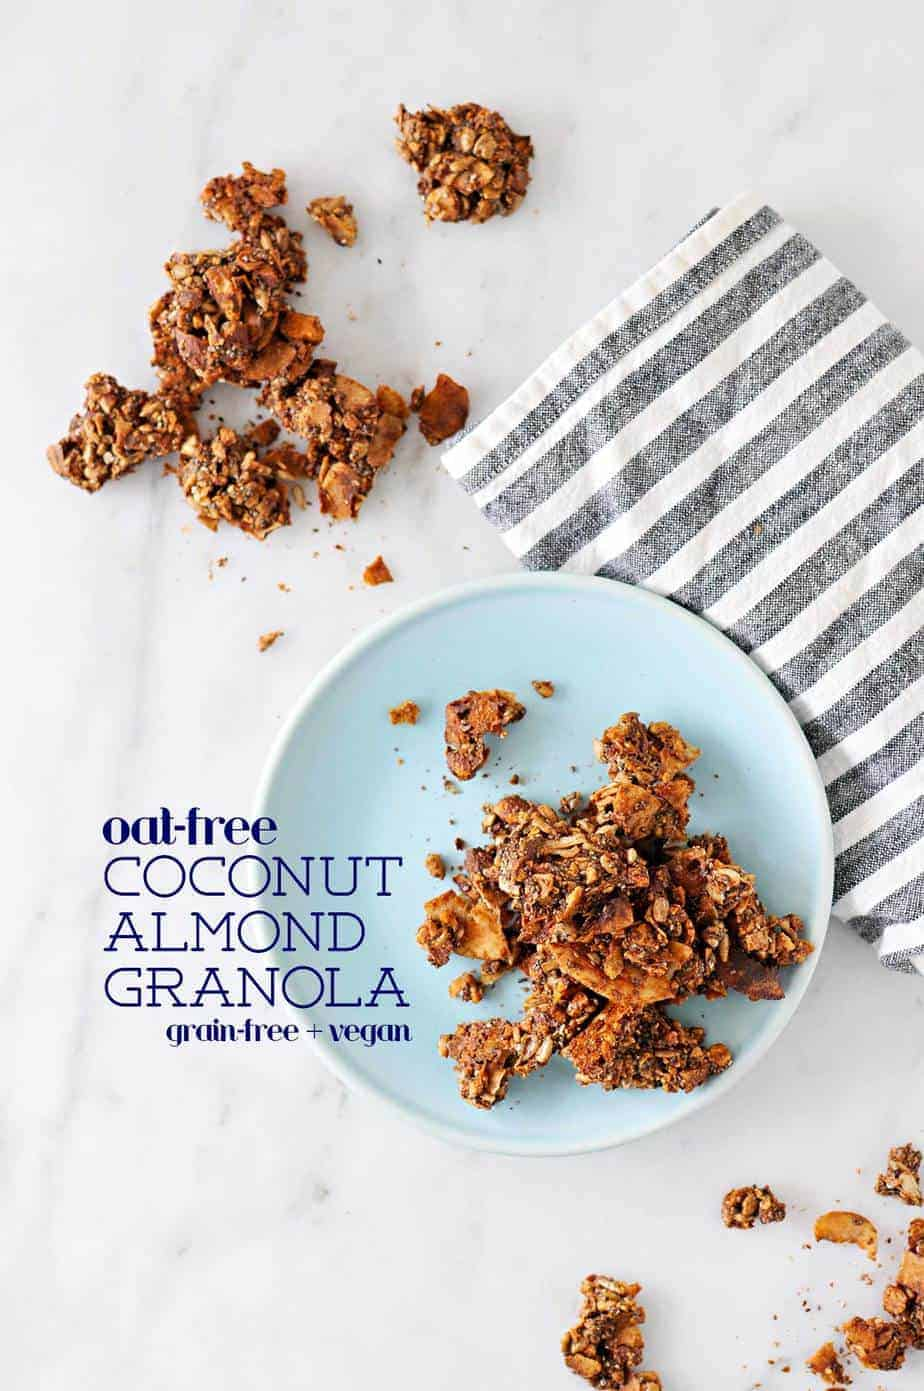 Oat-Free Coconut Almond Granola Recipe | Grain-Free + Vegan (via thepigandquill.com) #breakfast #mealprep